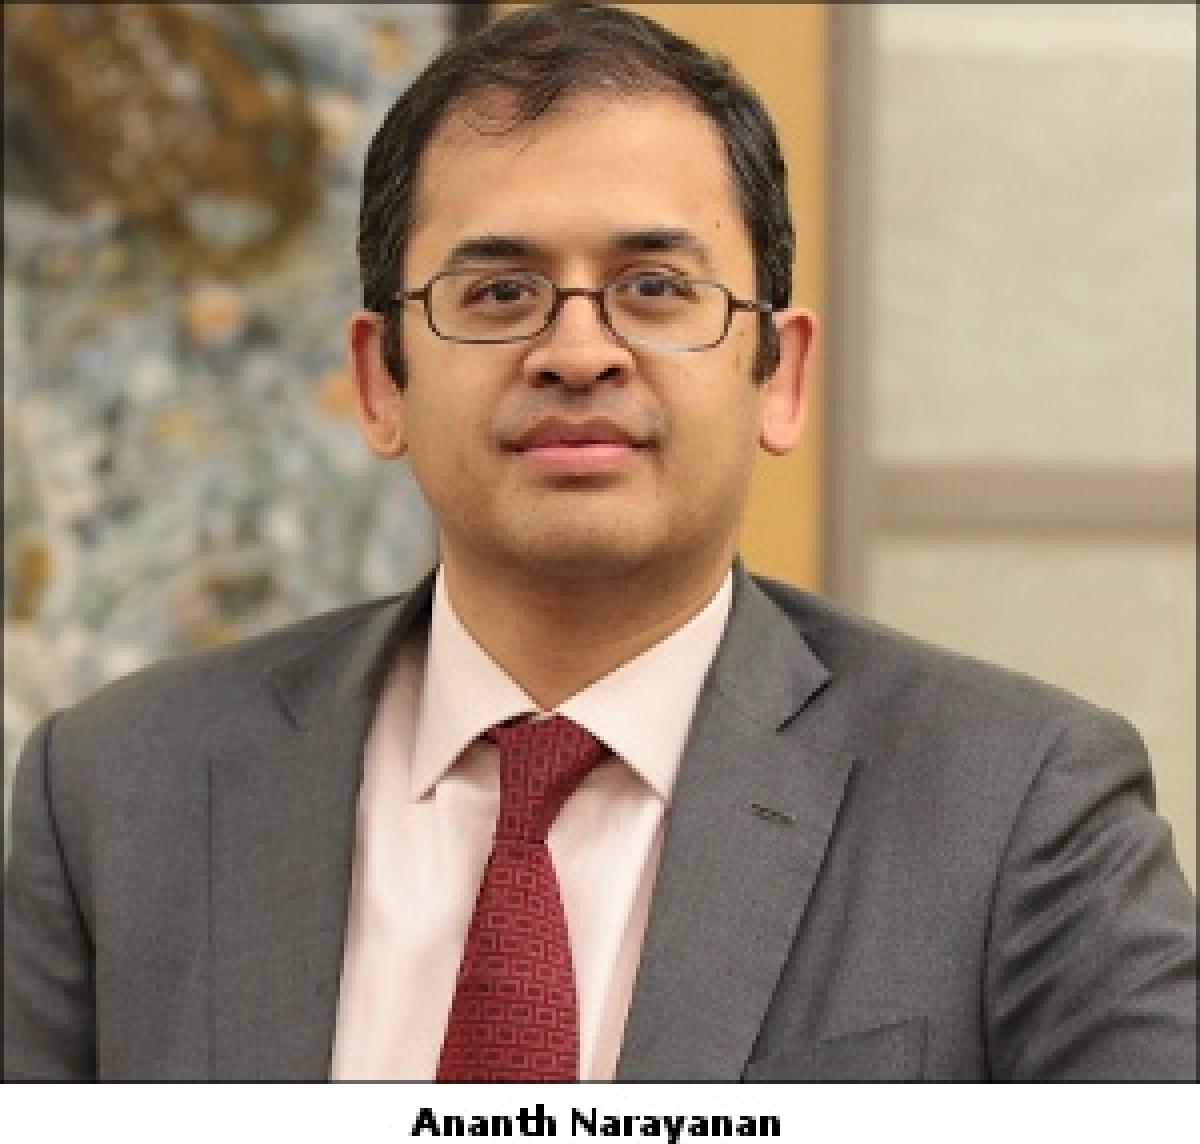 Star India's Gunjan Soni joins Myntra as CMO and head, international brands business